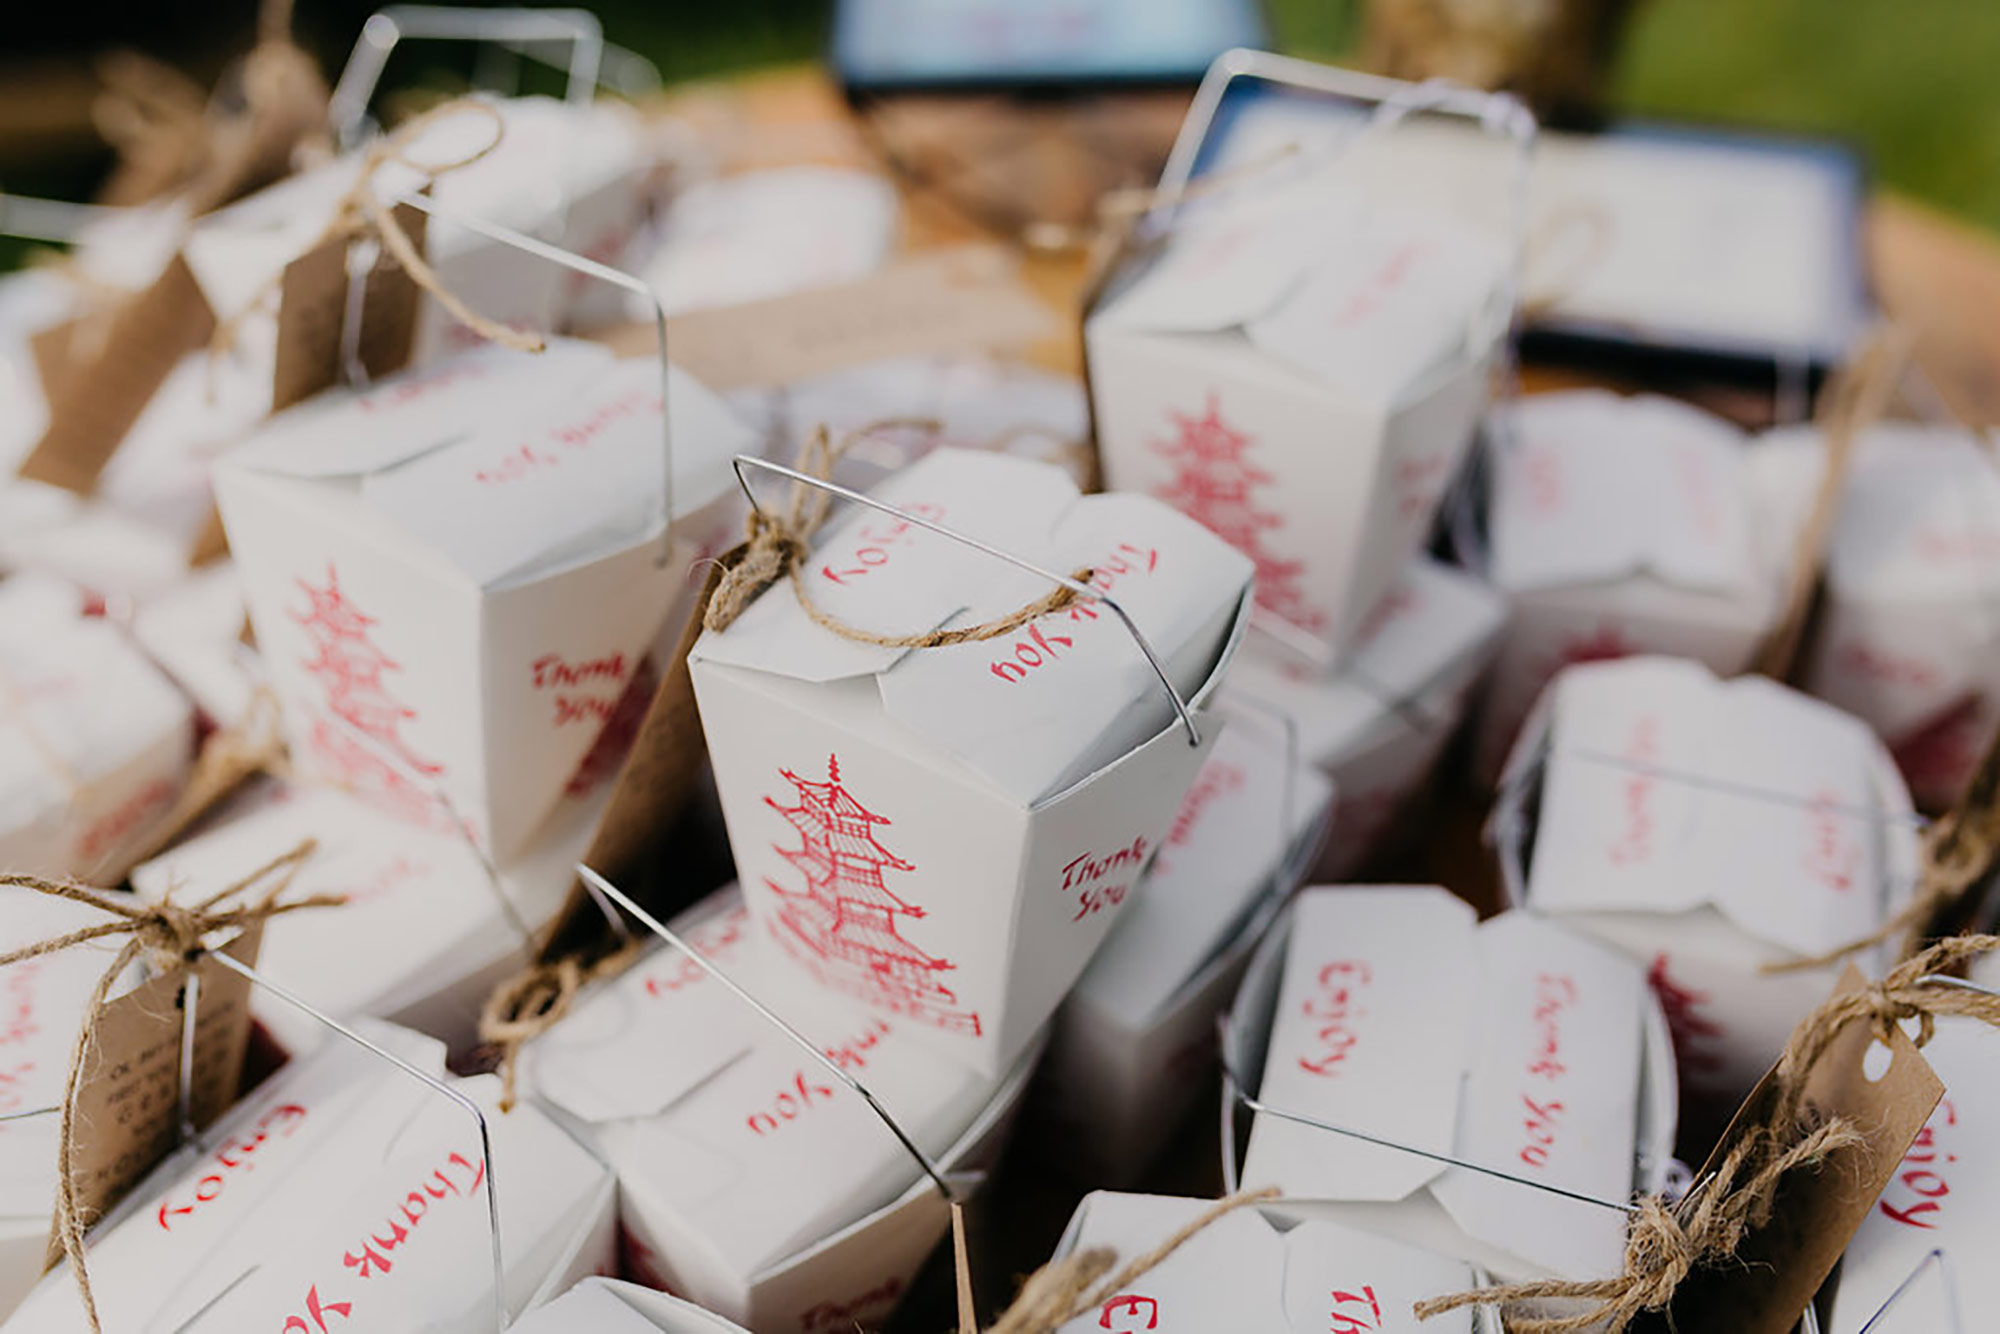 Kurtz-Orchards-Wedding-Niagara-wedding-Vineyard-Bride-Photography-by-Kayla-Rocca-028.JPG